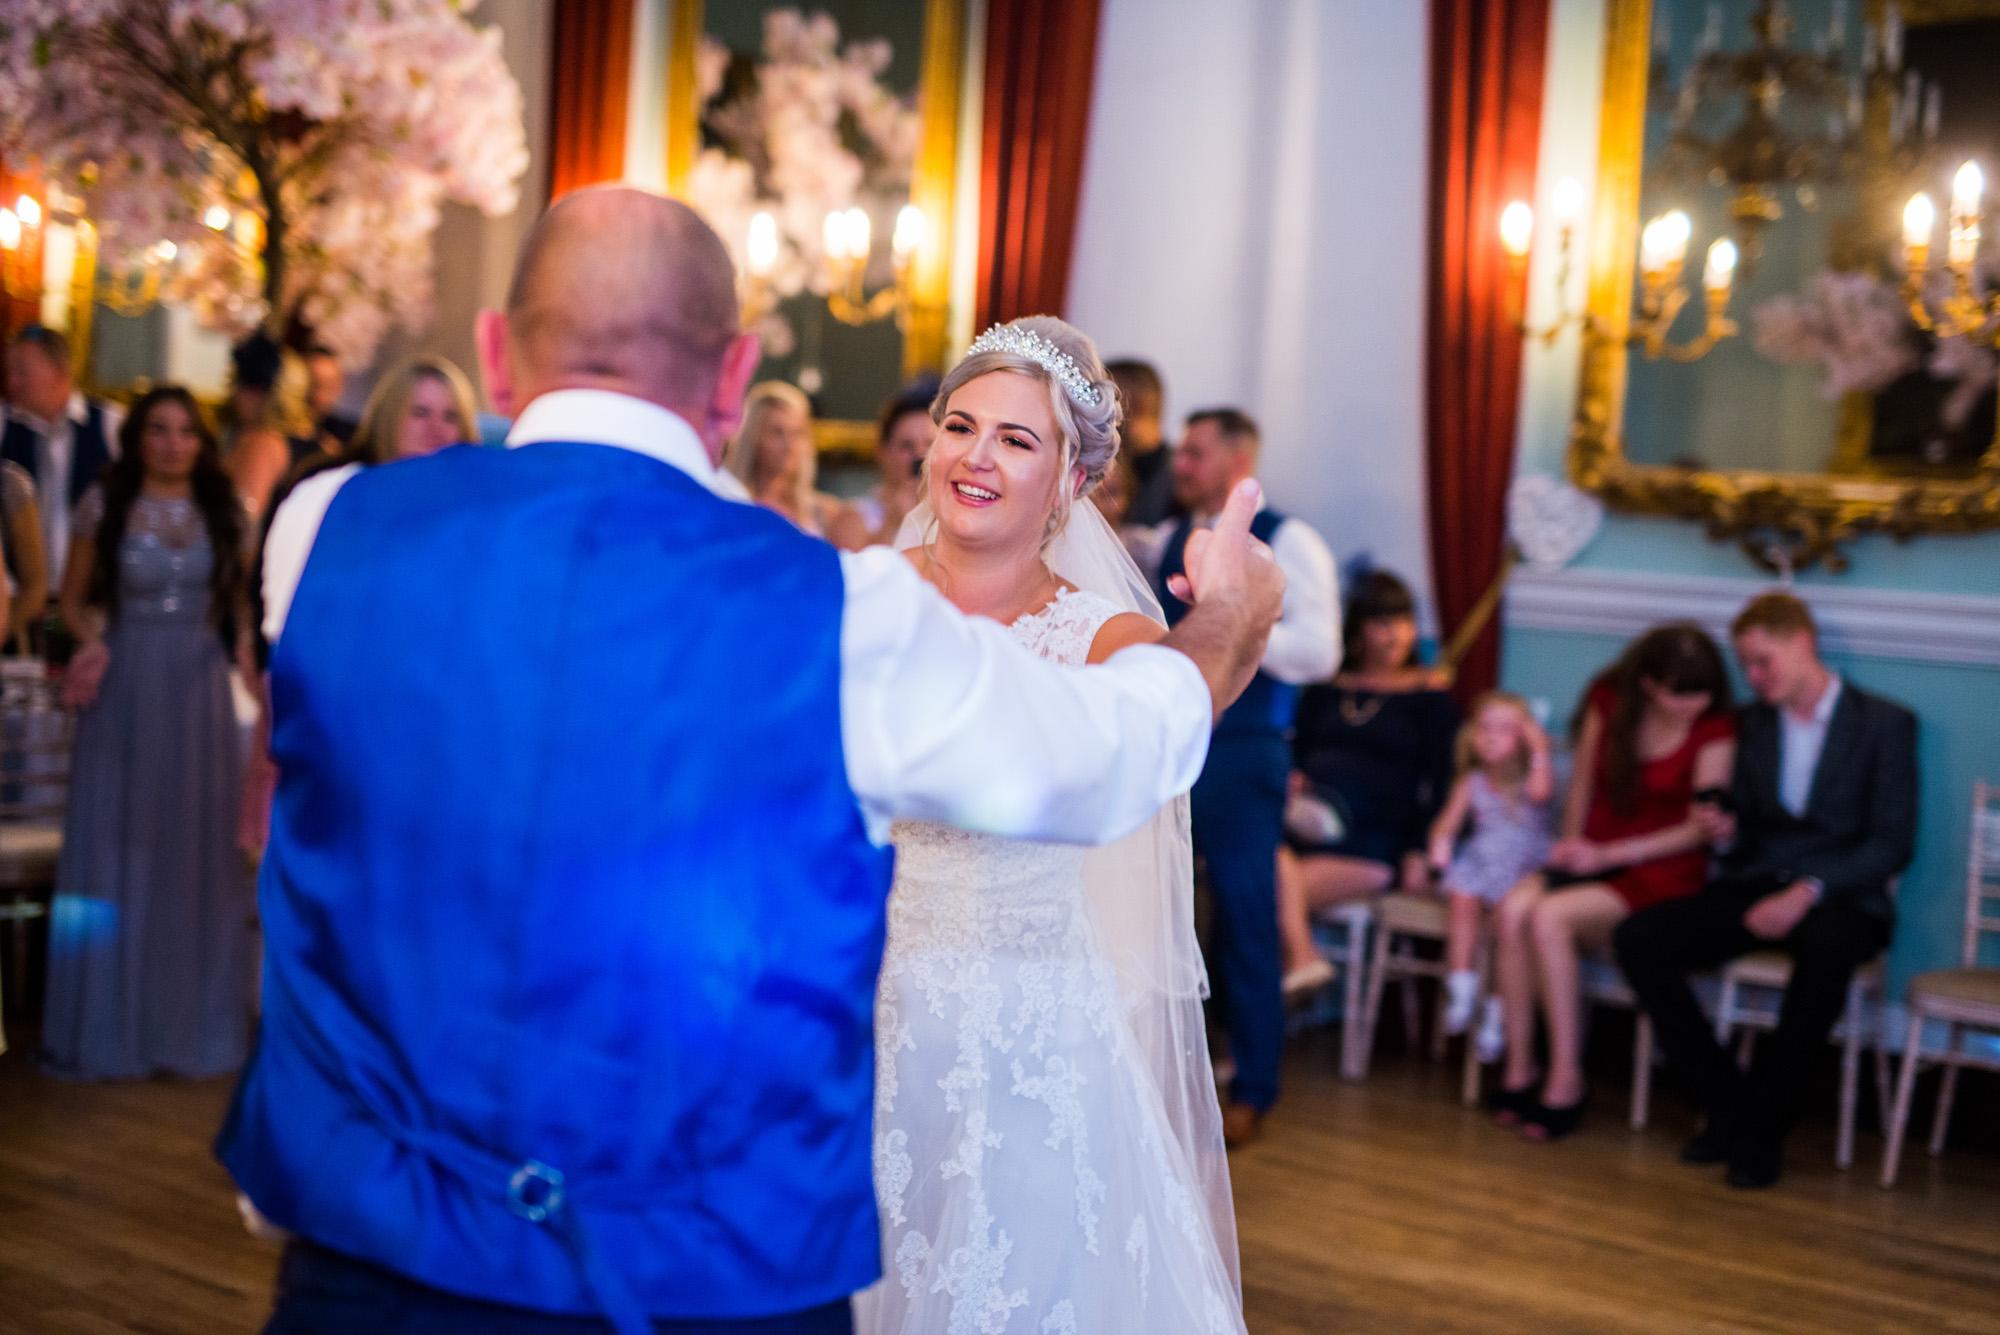 Savannah and Josh wedding photos (323 of 350).jpg